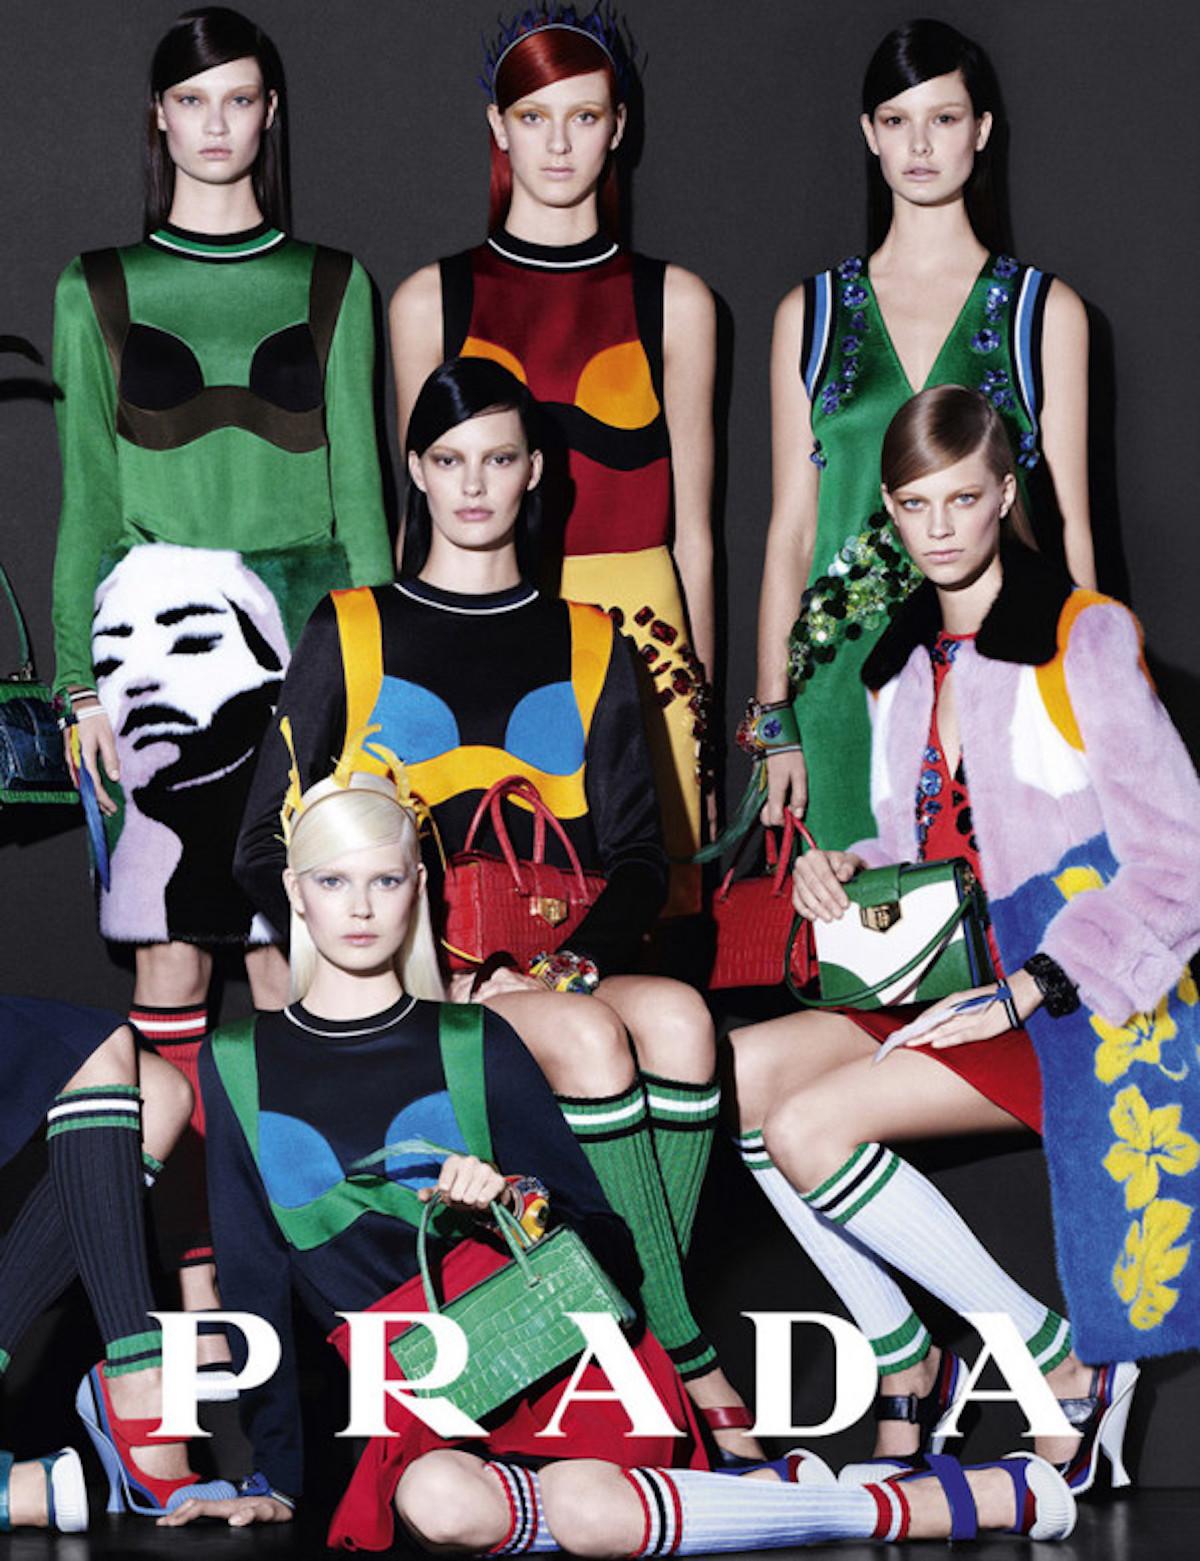 PRADA-Spring-Summer-2014-Campaign-02-598x778